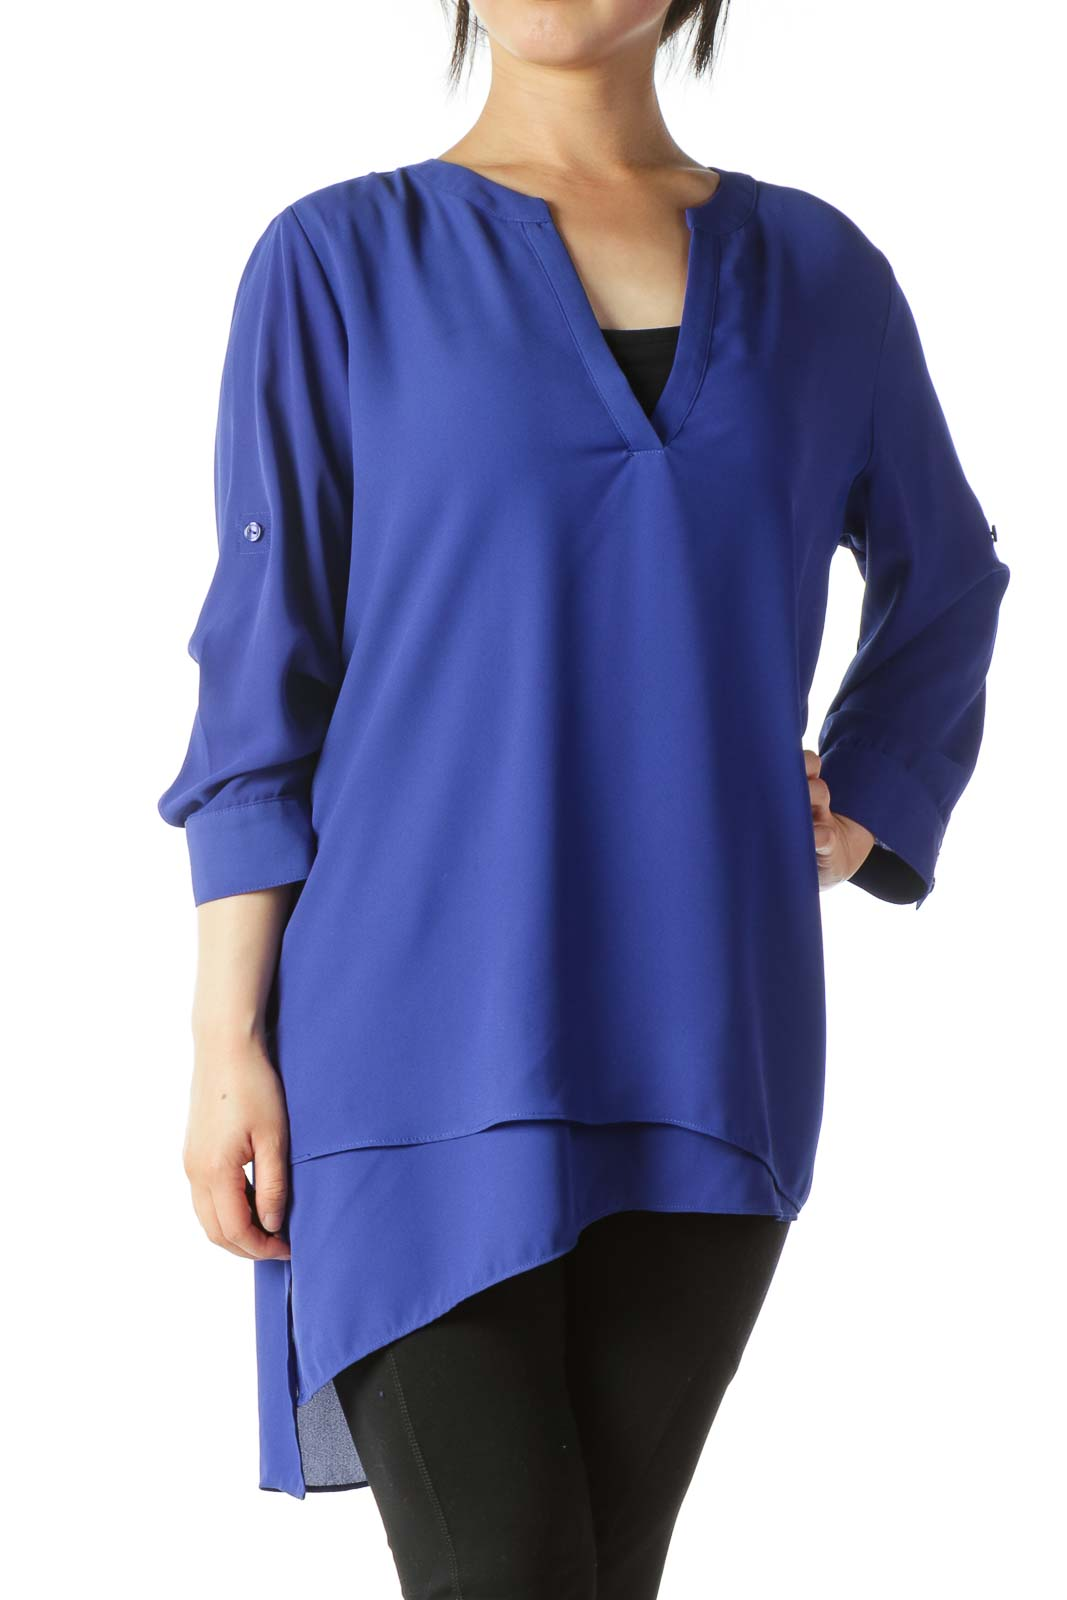 Royal Blue V-Neck 3/4-Sleeve Long Blouse